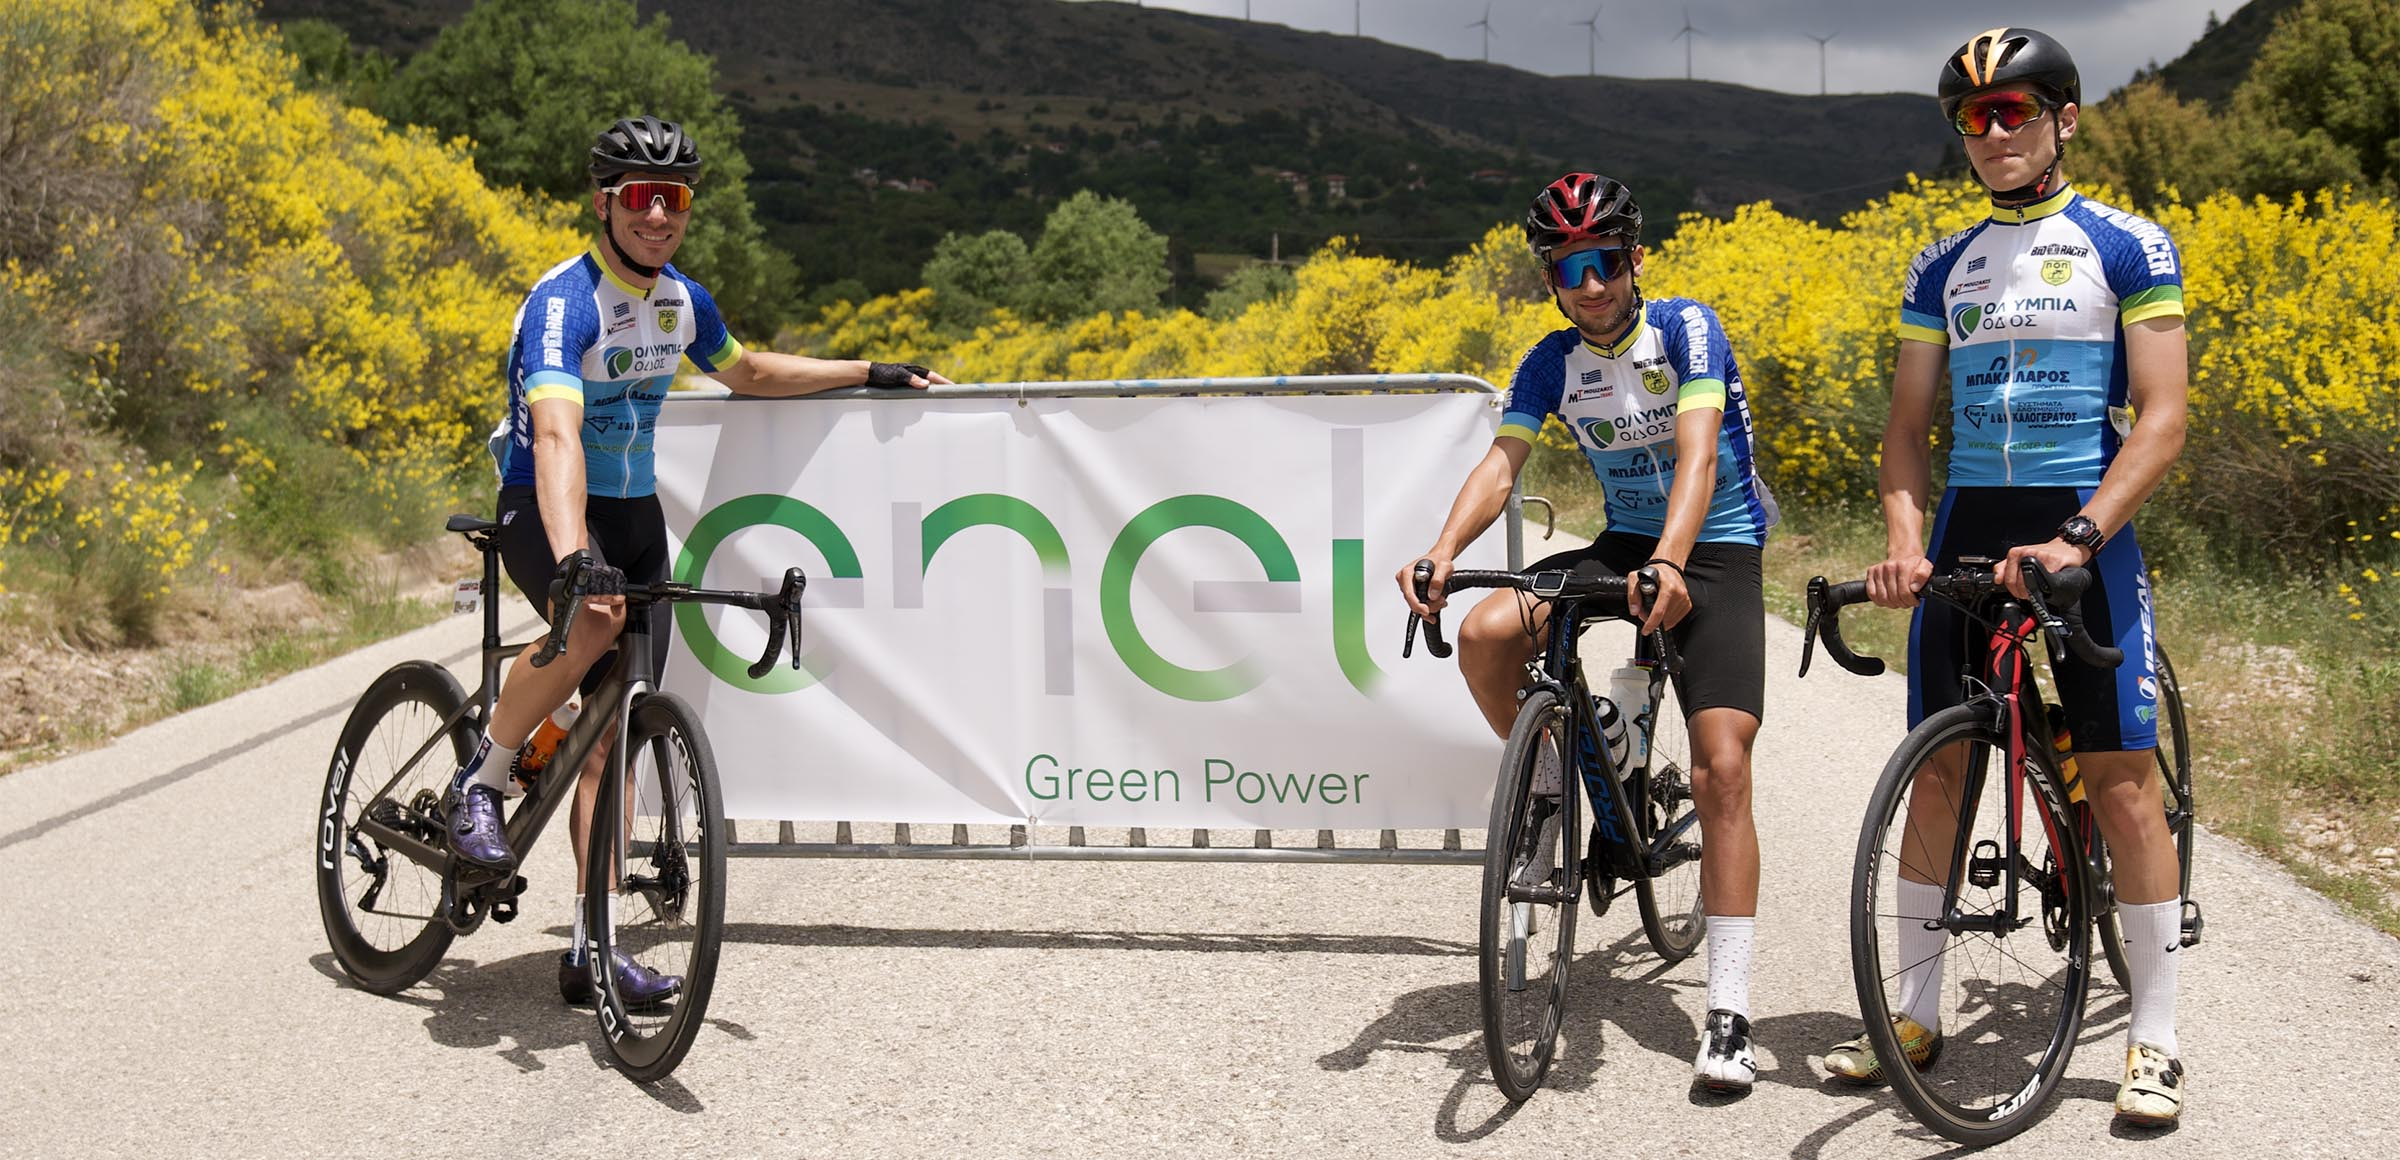 ENEL GREEN POWER: Ο ιστορικός ποδηλατικός αγώνας «Θυσίας»: ενέργεια με κάθε τρόπο